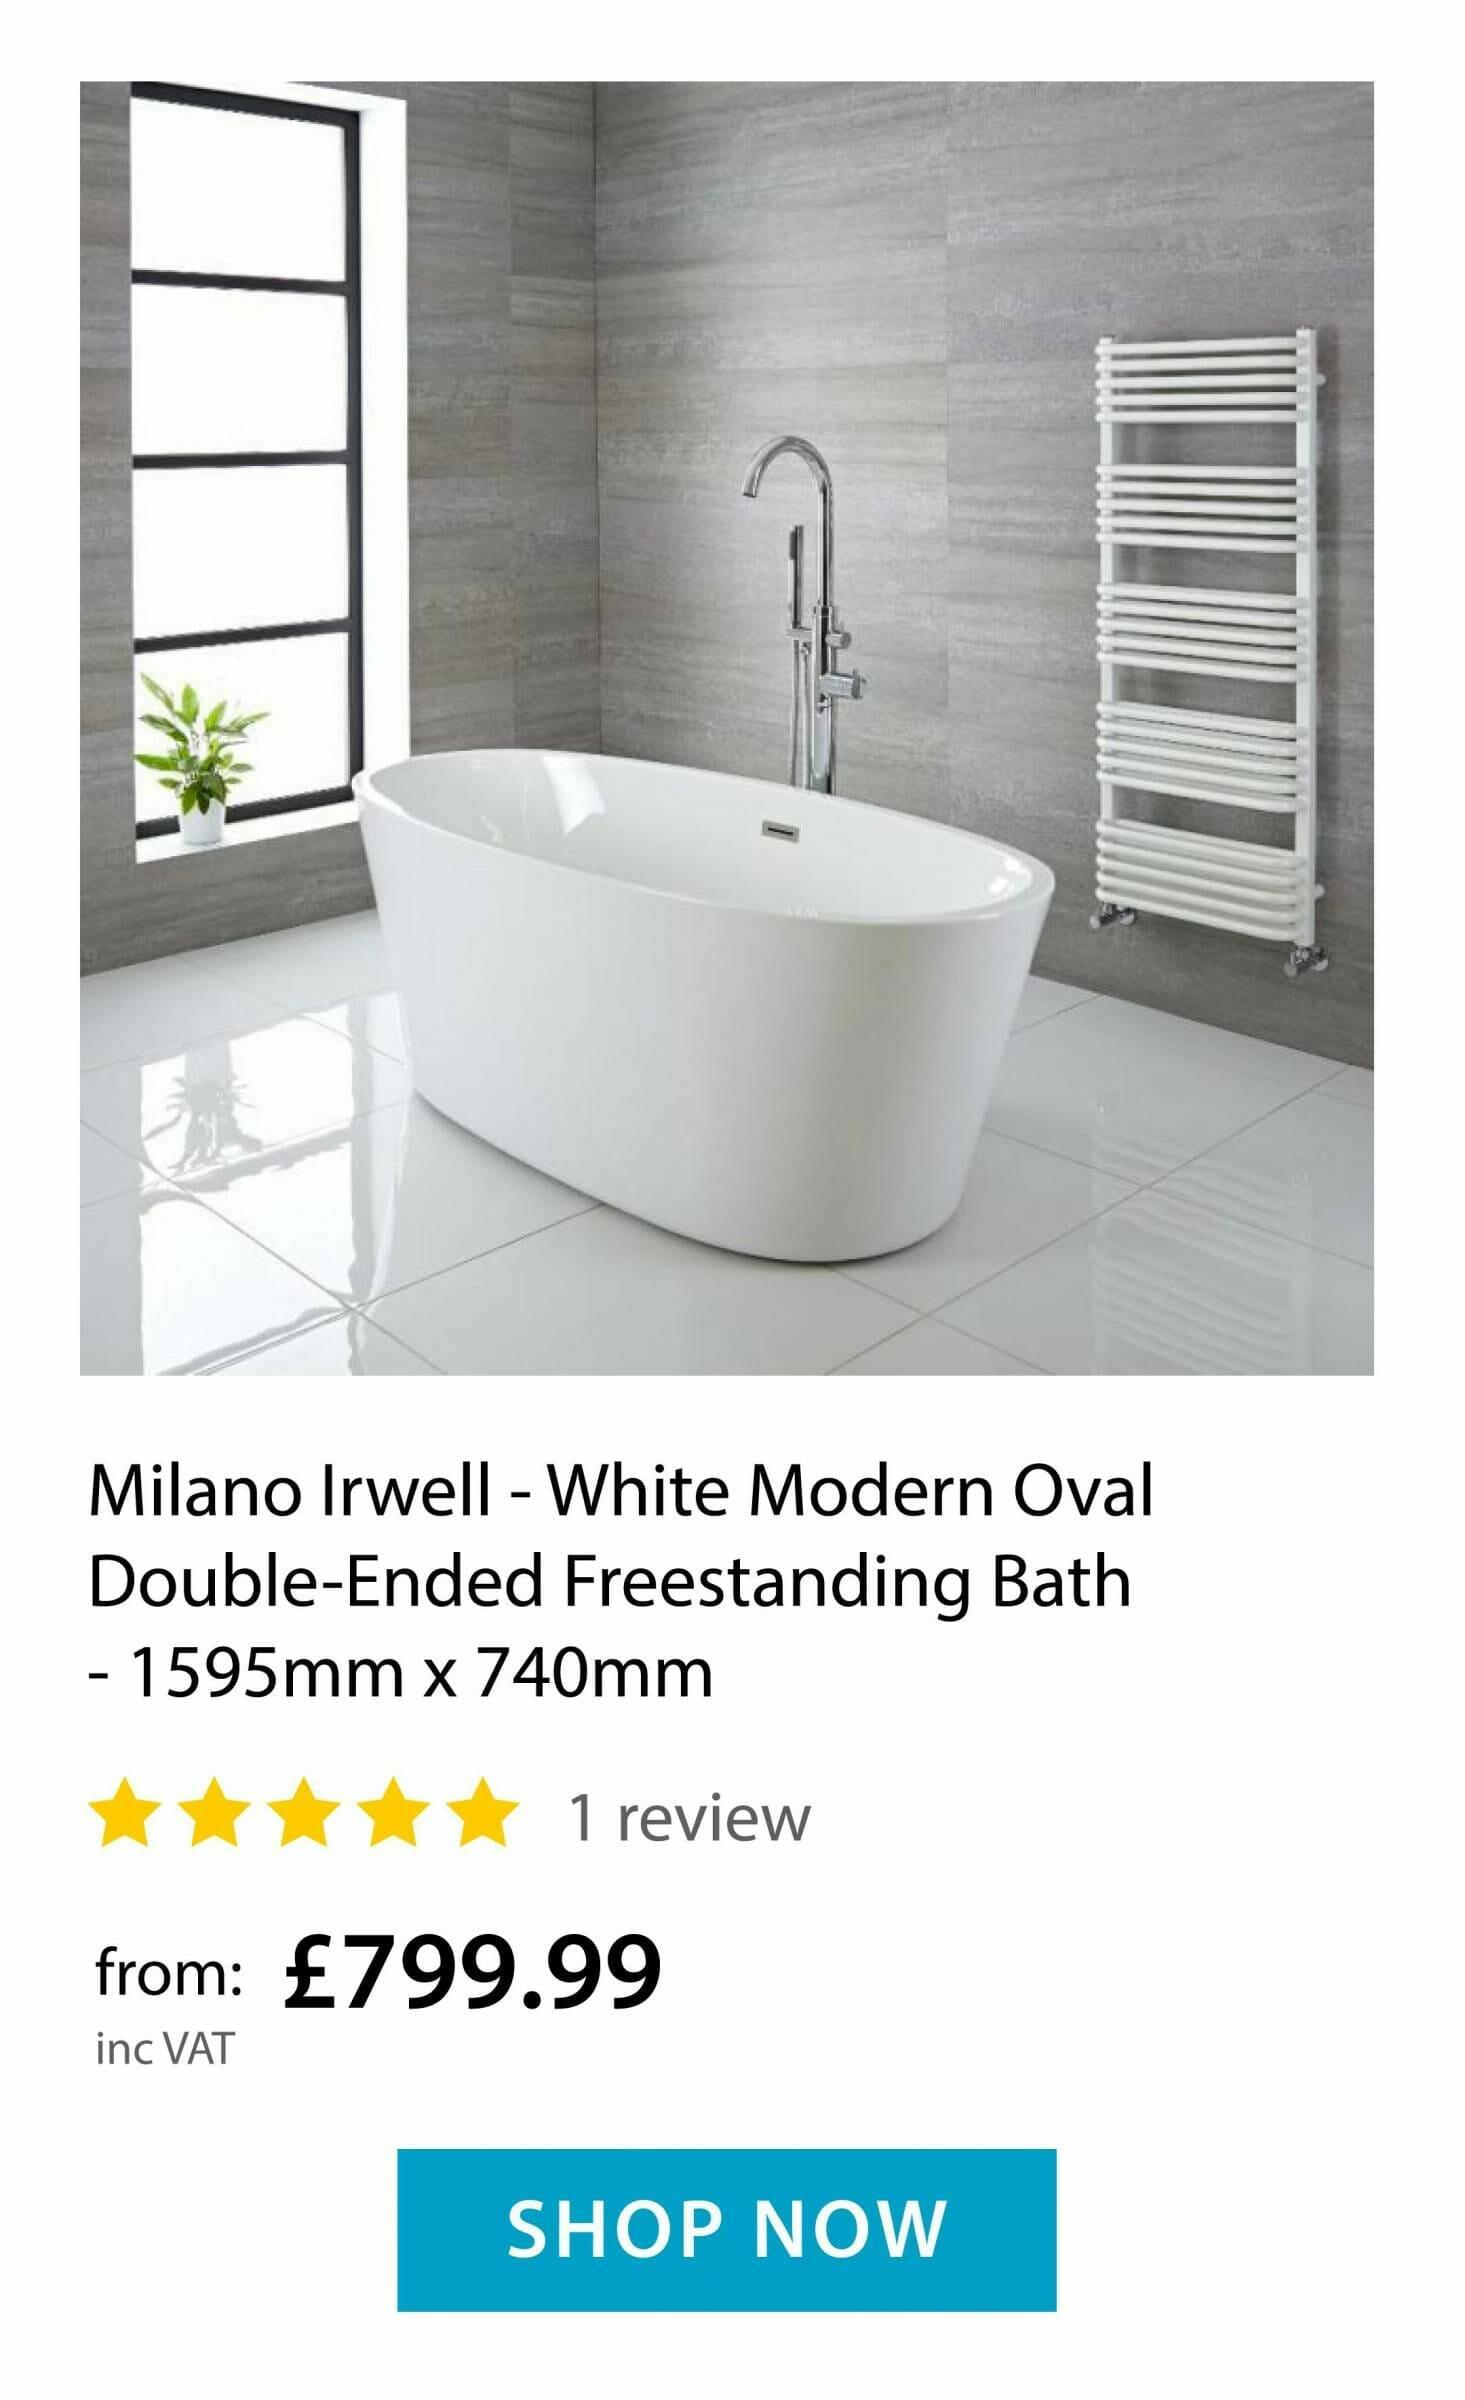 Milano Irwell Freestanding Bath Tub